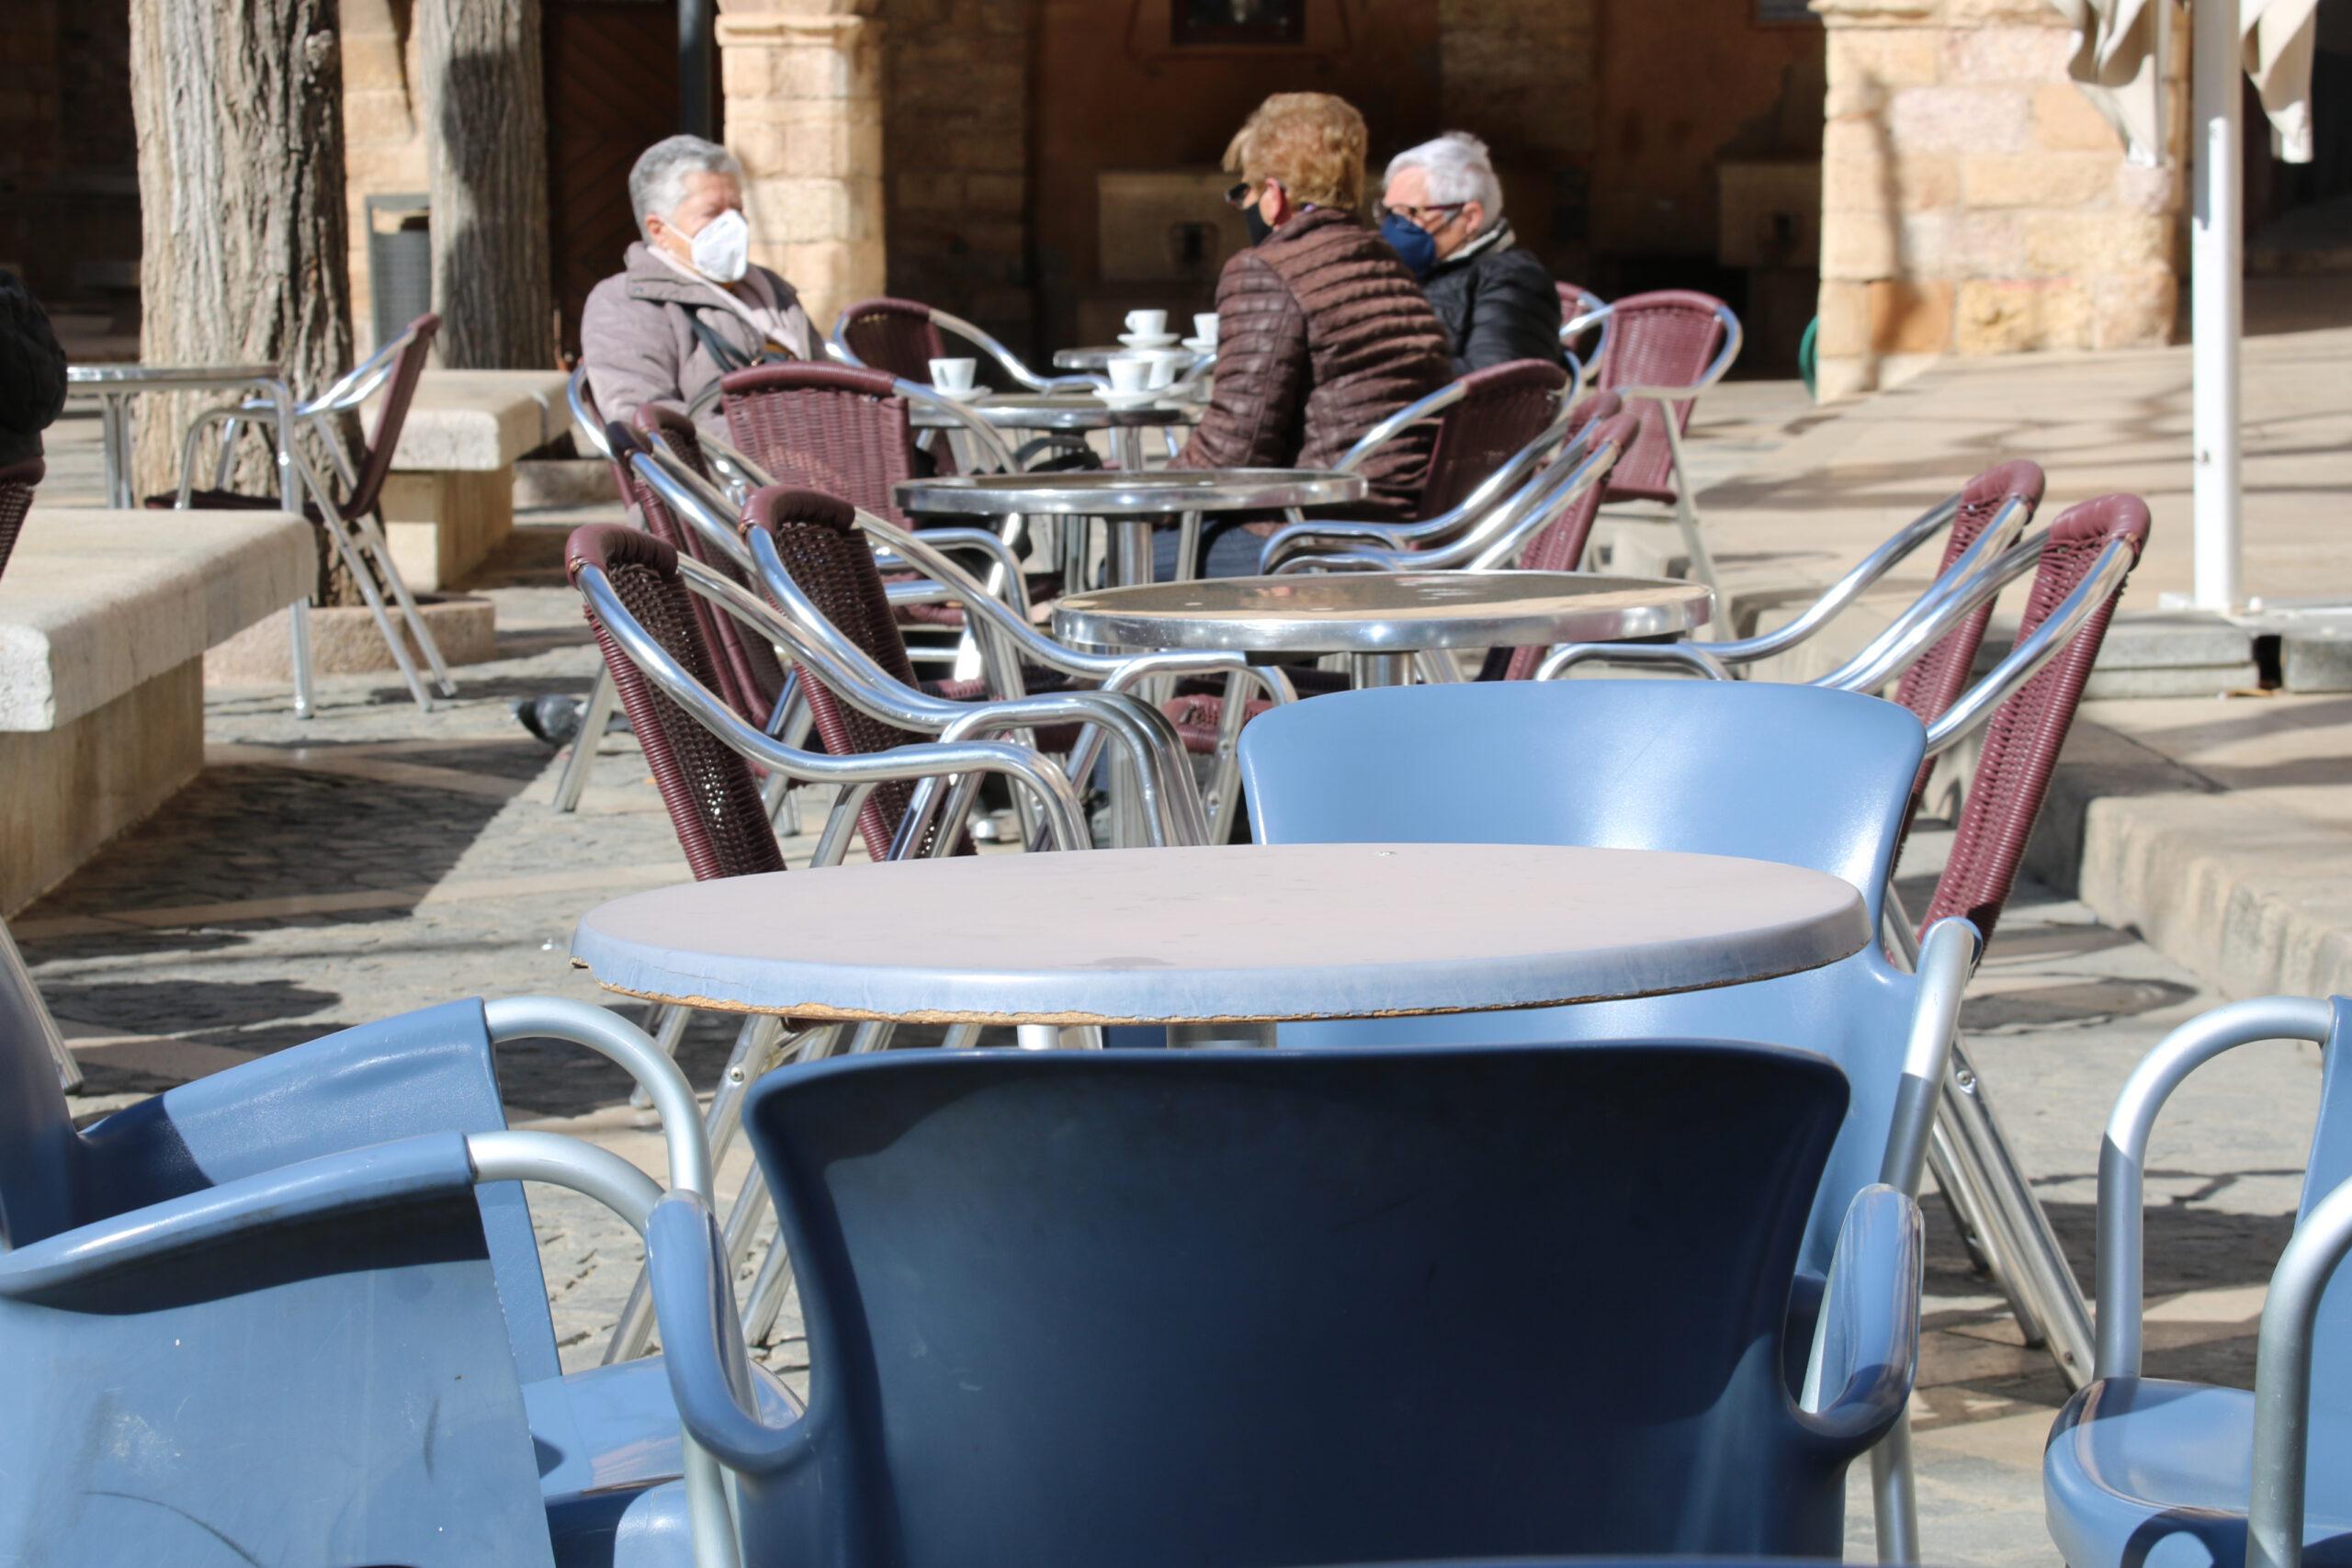 Unes dones consumint a les terrasses de la plaça Major de Montblanc, i taules buides en primer terme | ACN